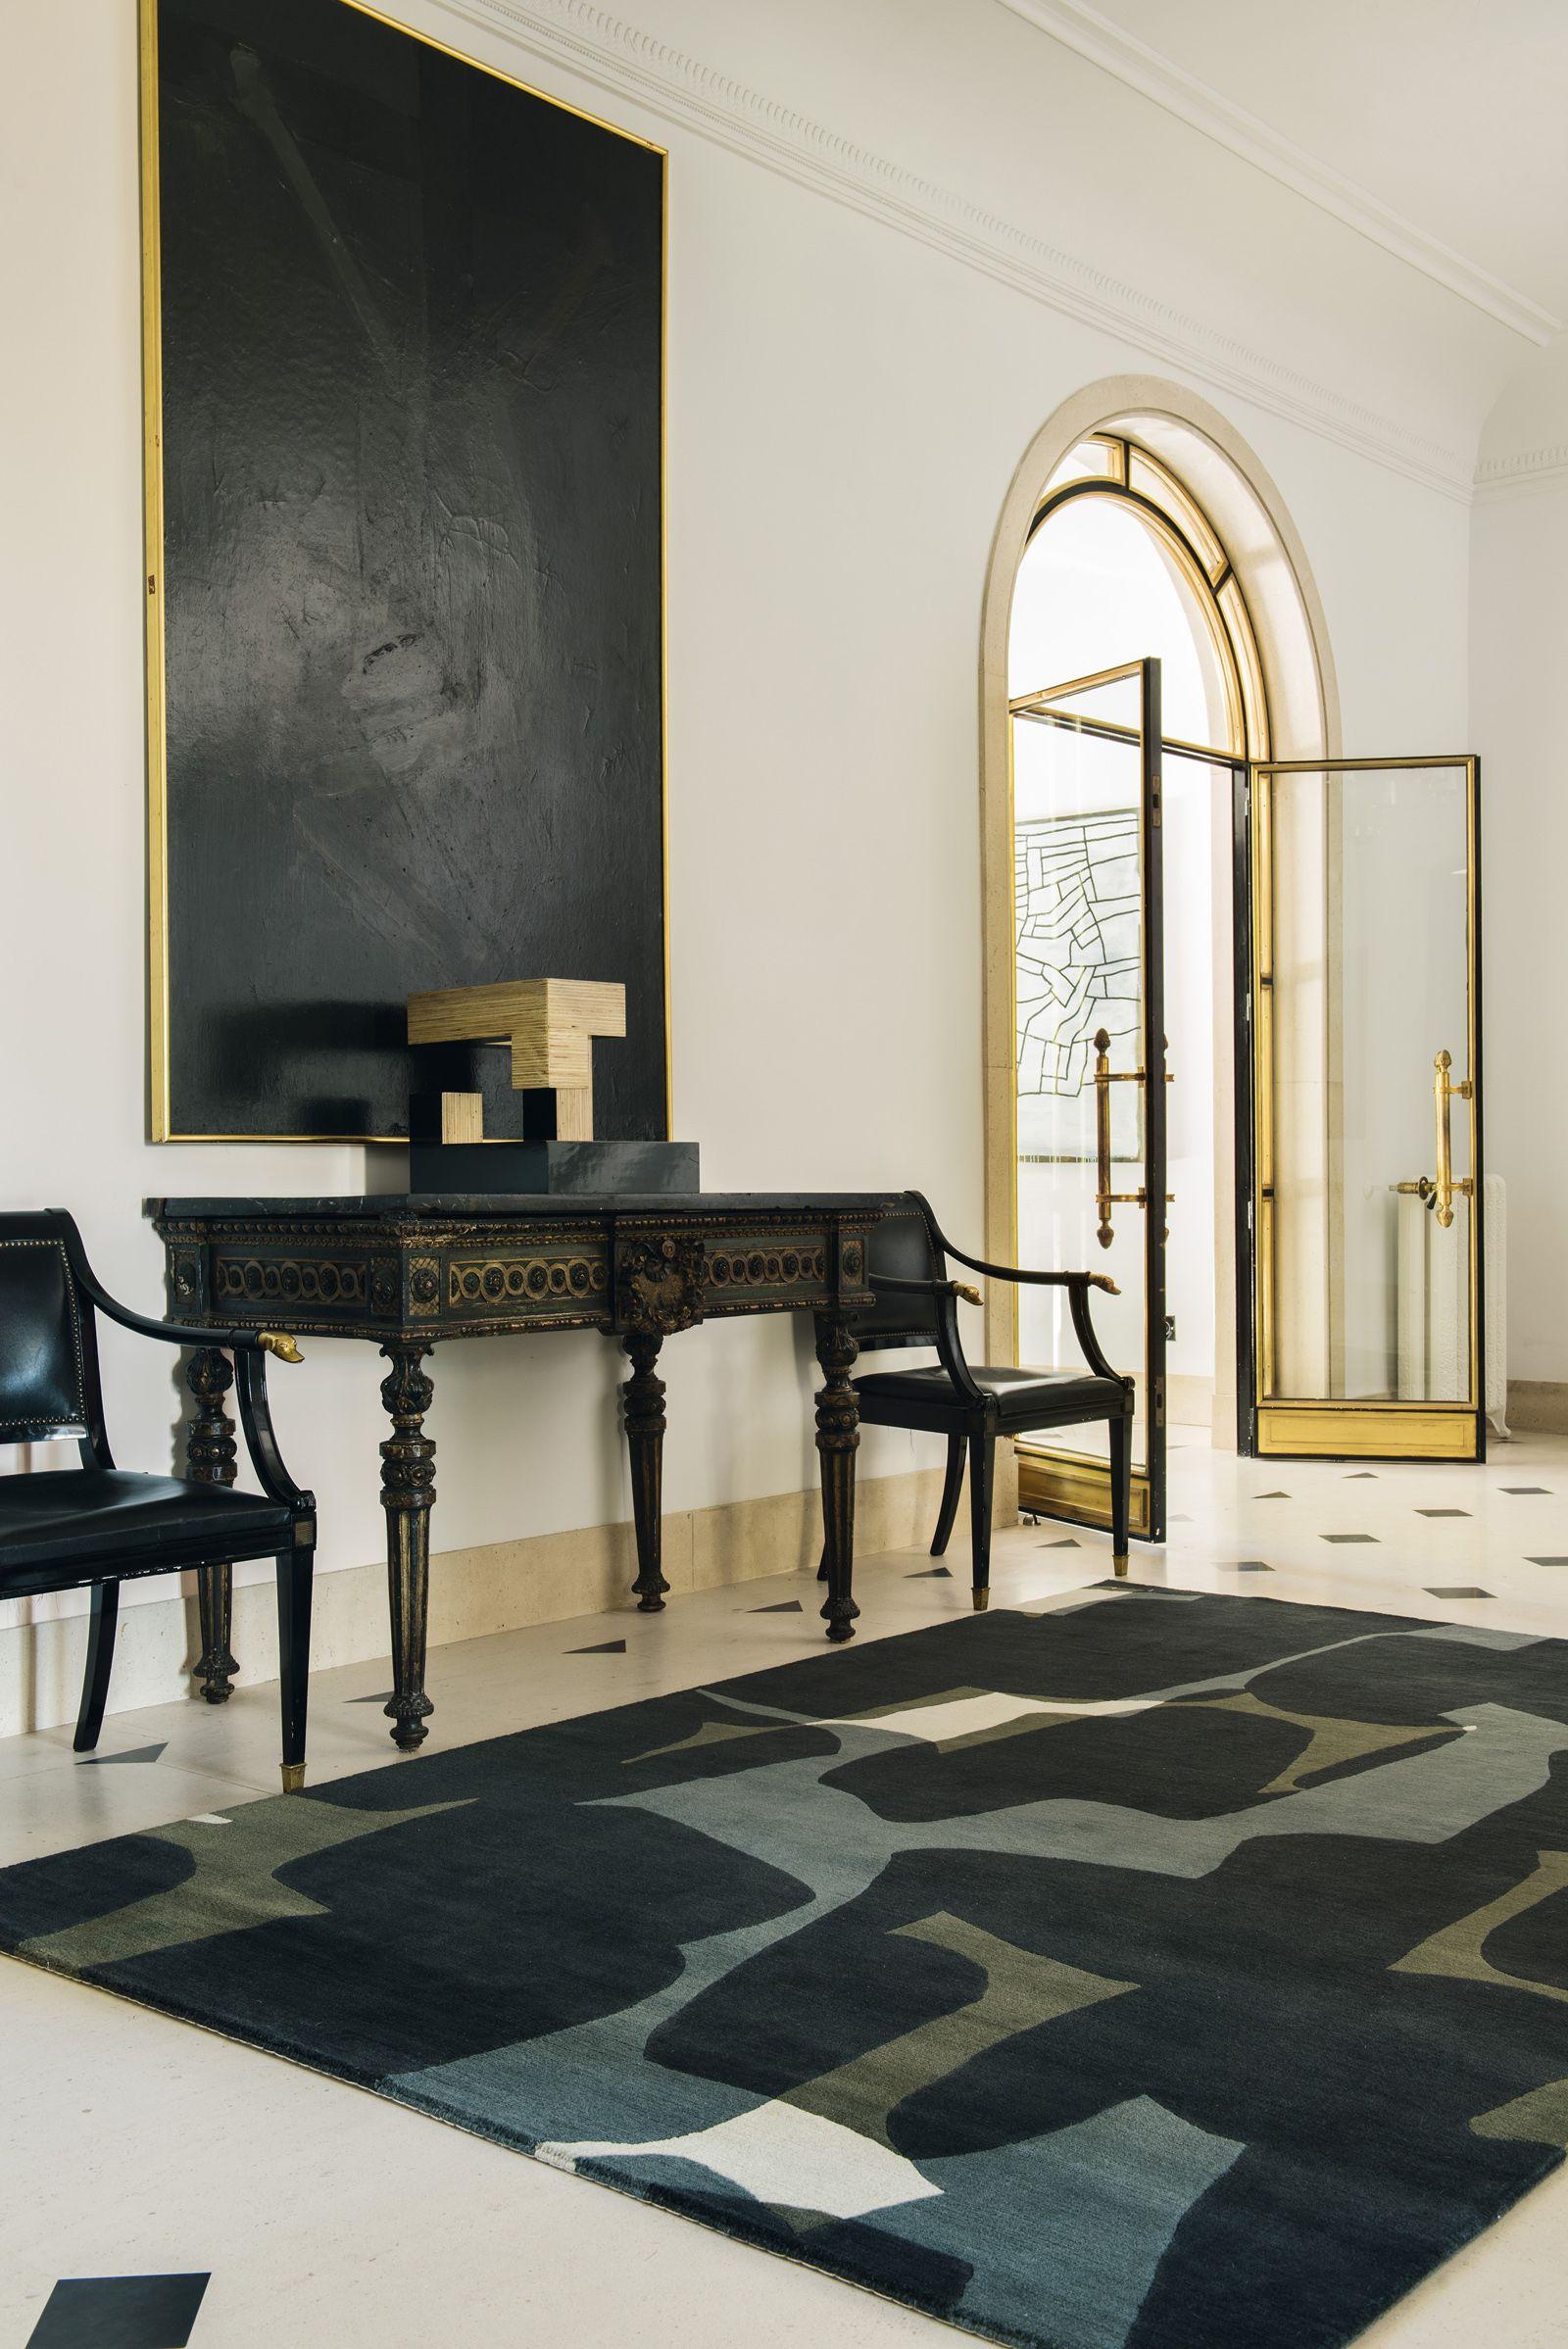 Modern hallway furniture ideas  eclectic  Entrances Hallways Corridors Lobbies Foyers